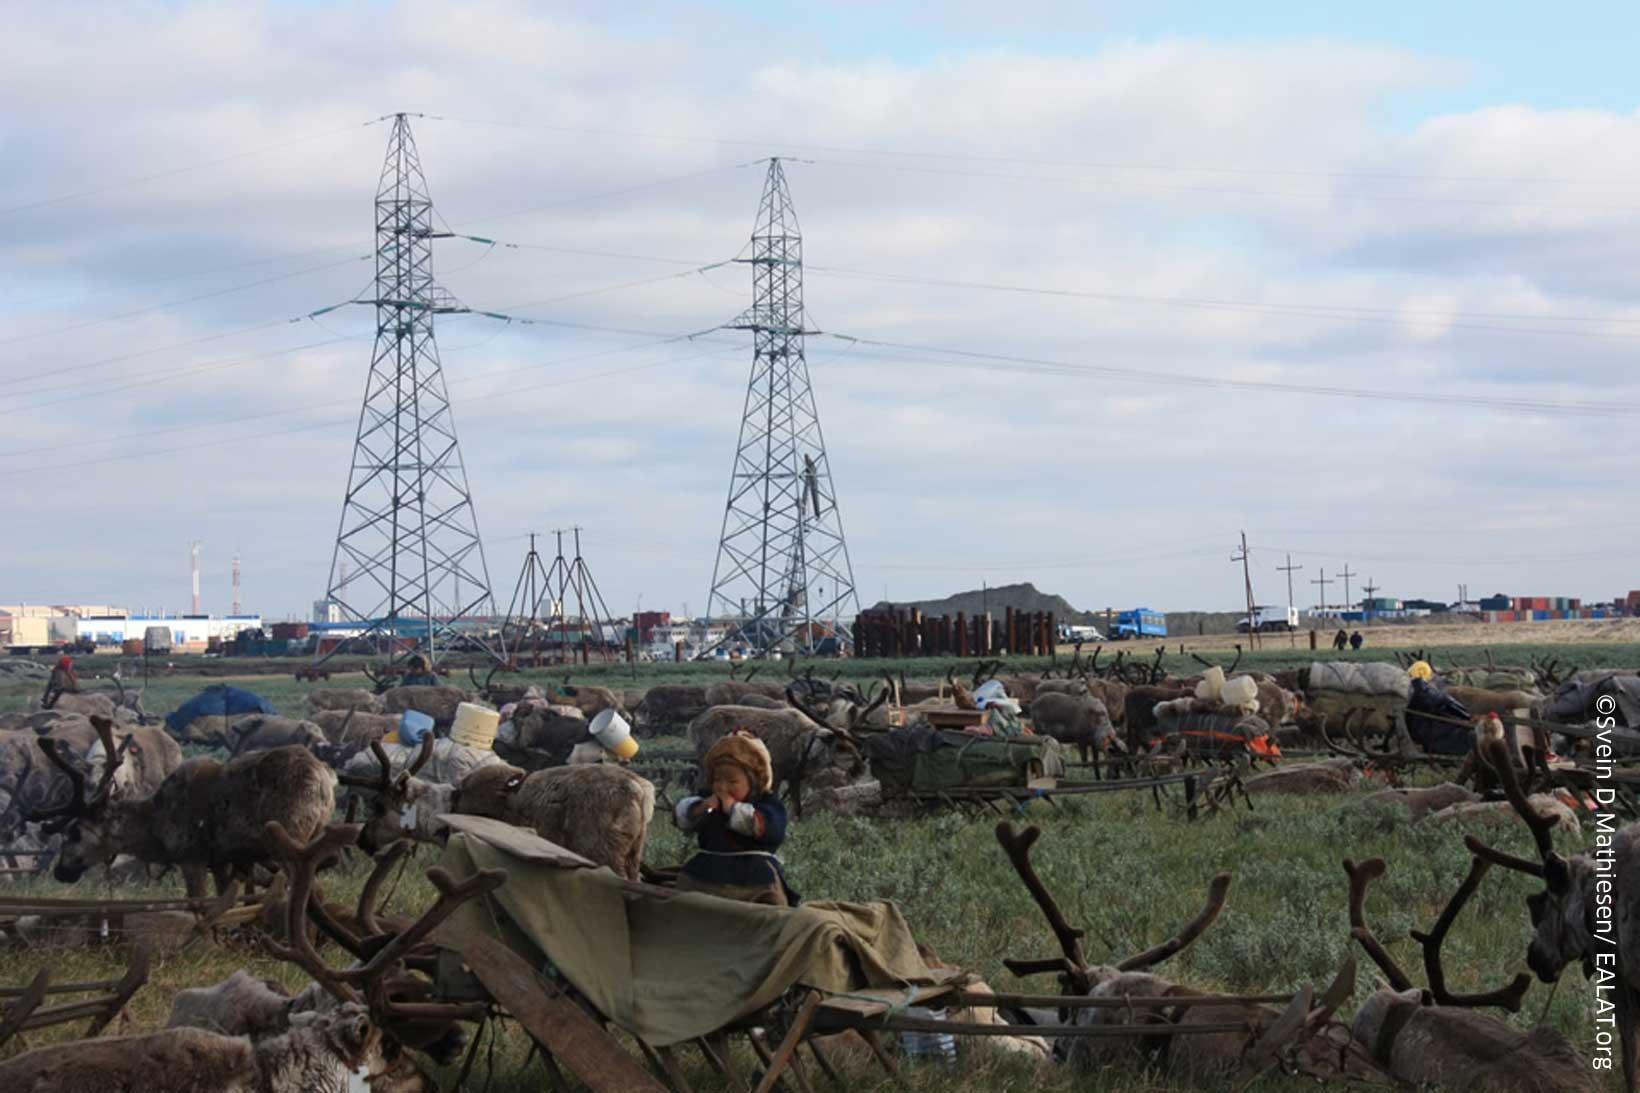 Nenets reindeer herders alongside modern industry.